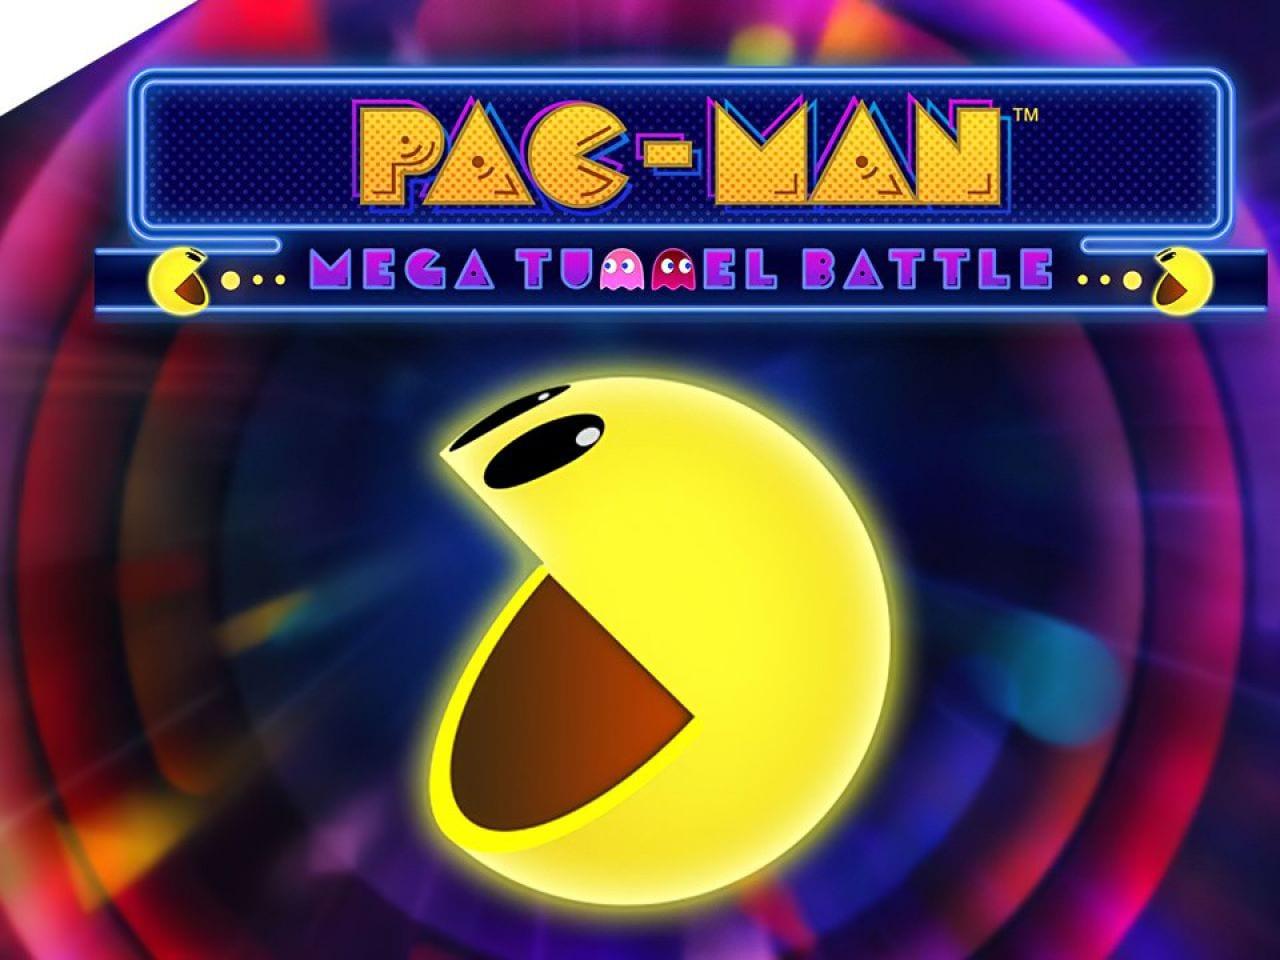 Bandai Namco annuncia Pac-Man Mega Tunnel Battle per Google Stadia